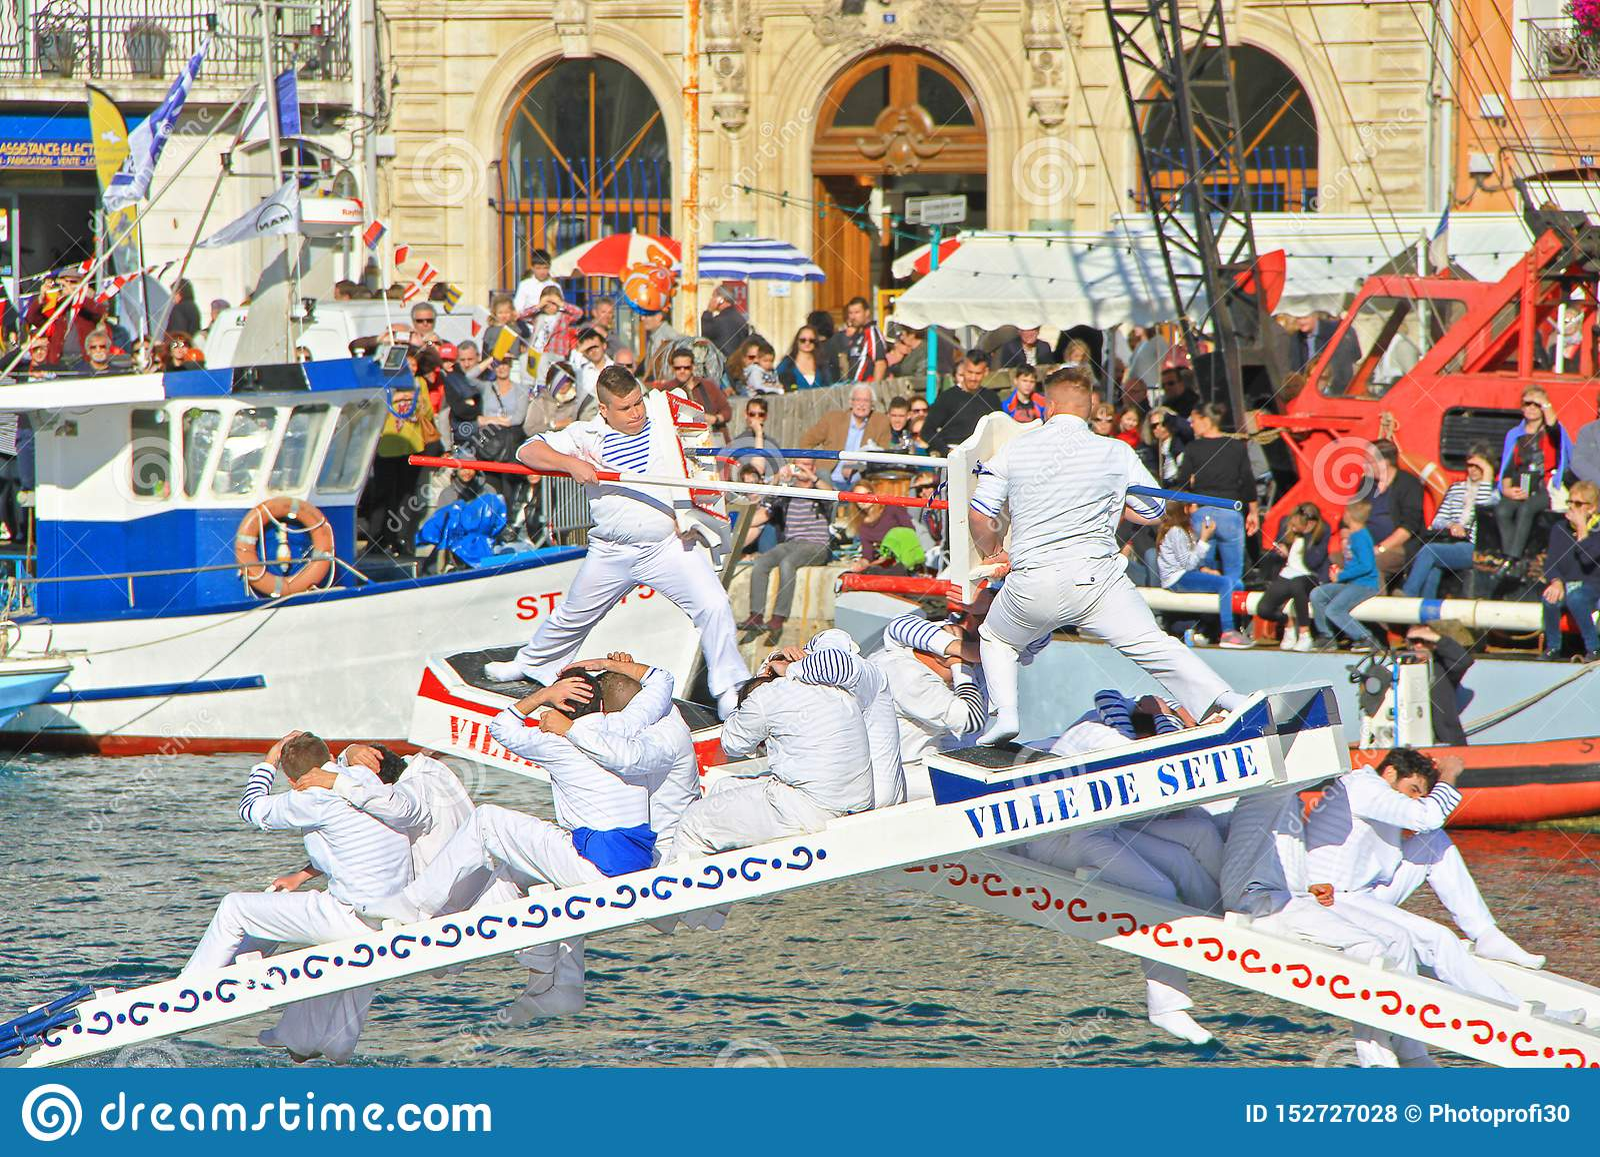 Stopover in Sete – Maritime Traditions Festival